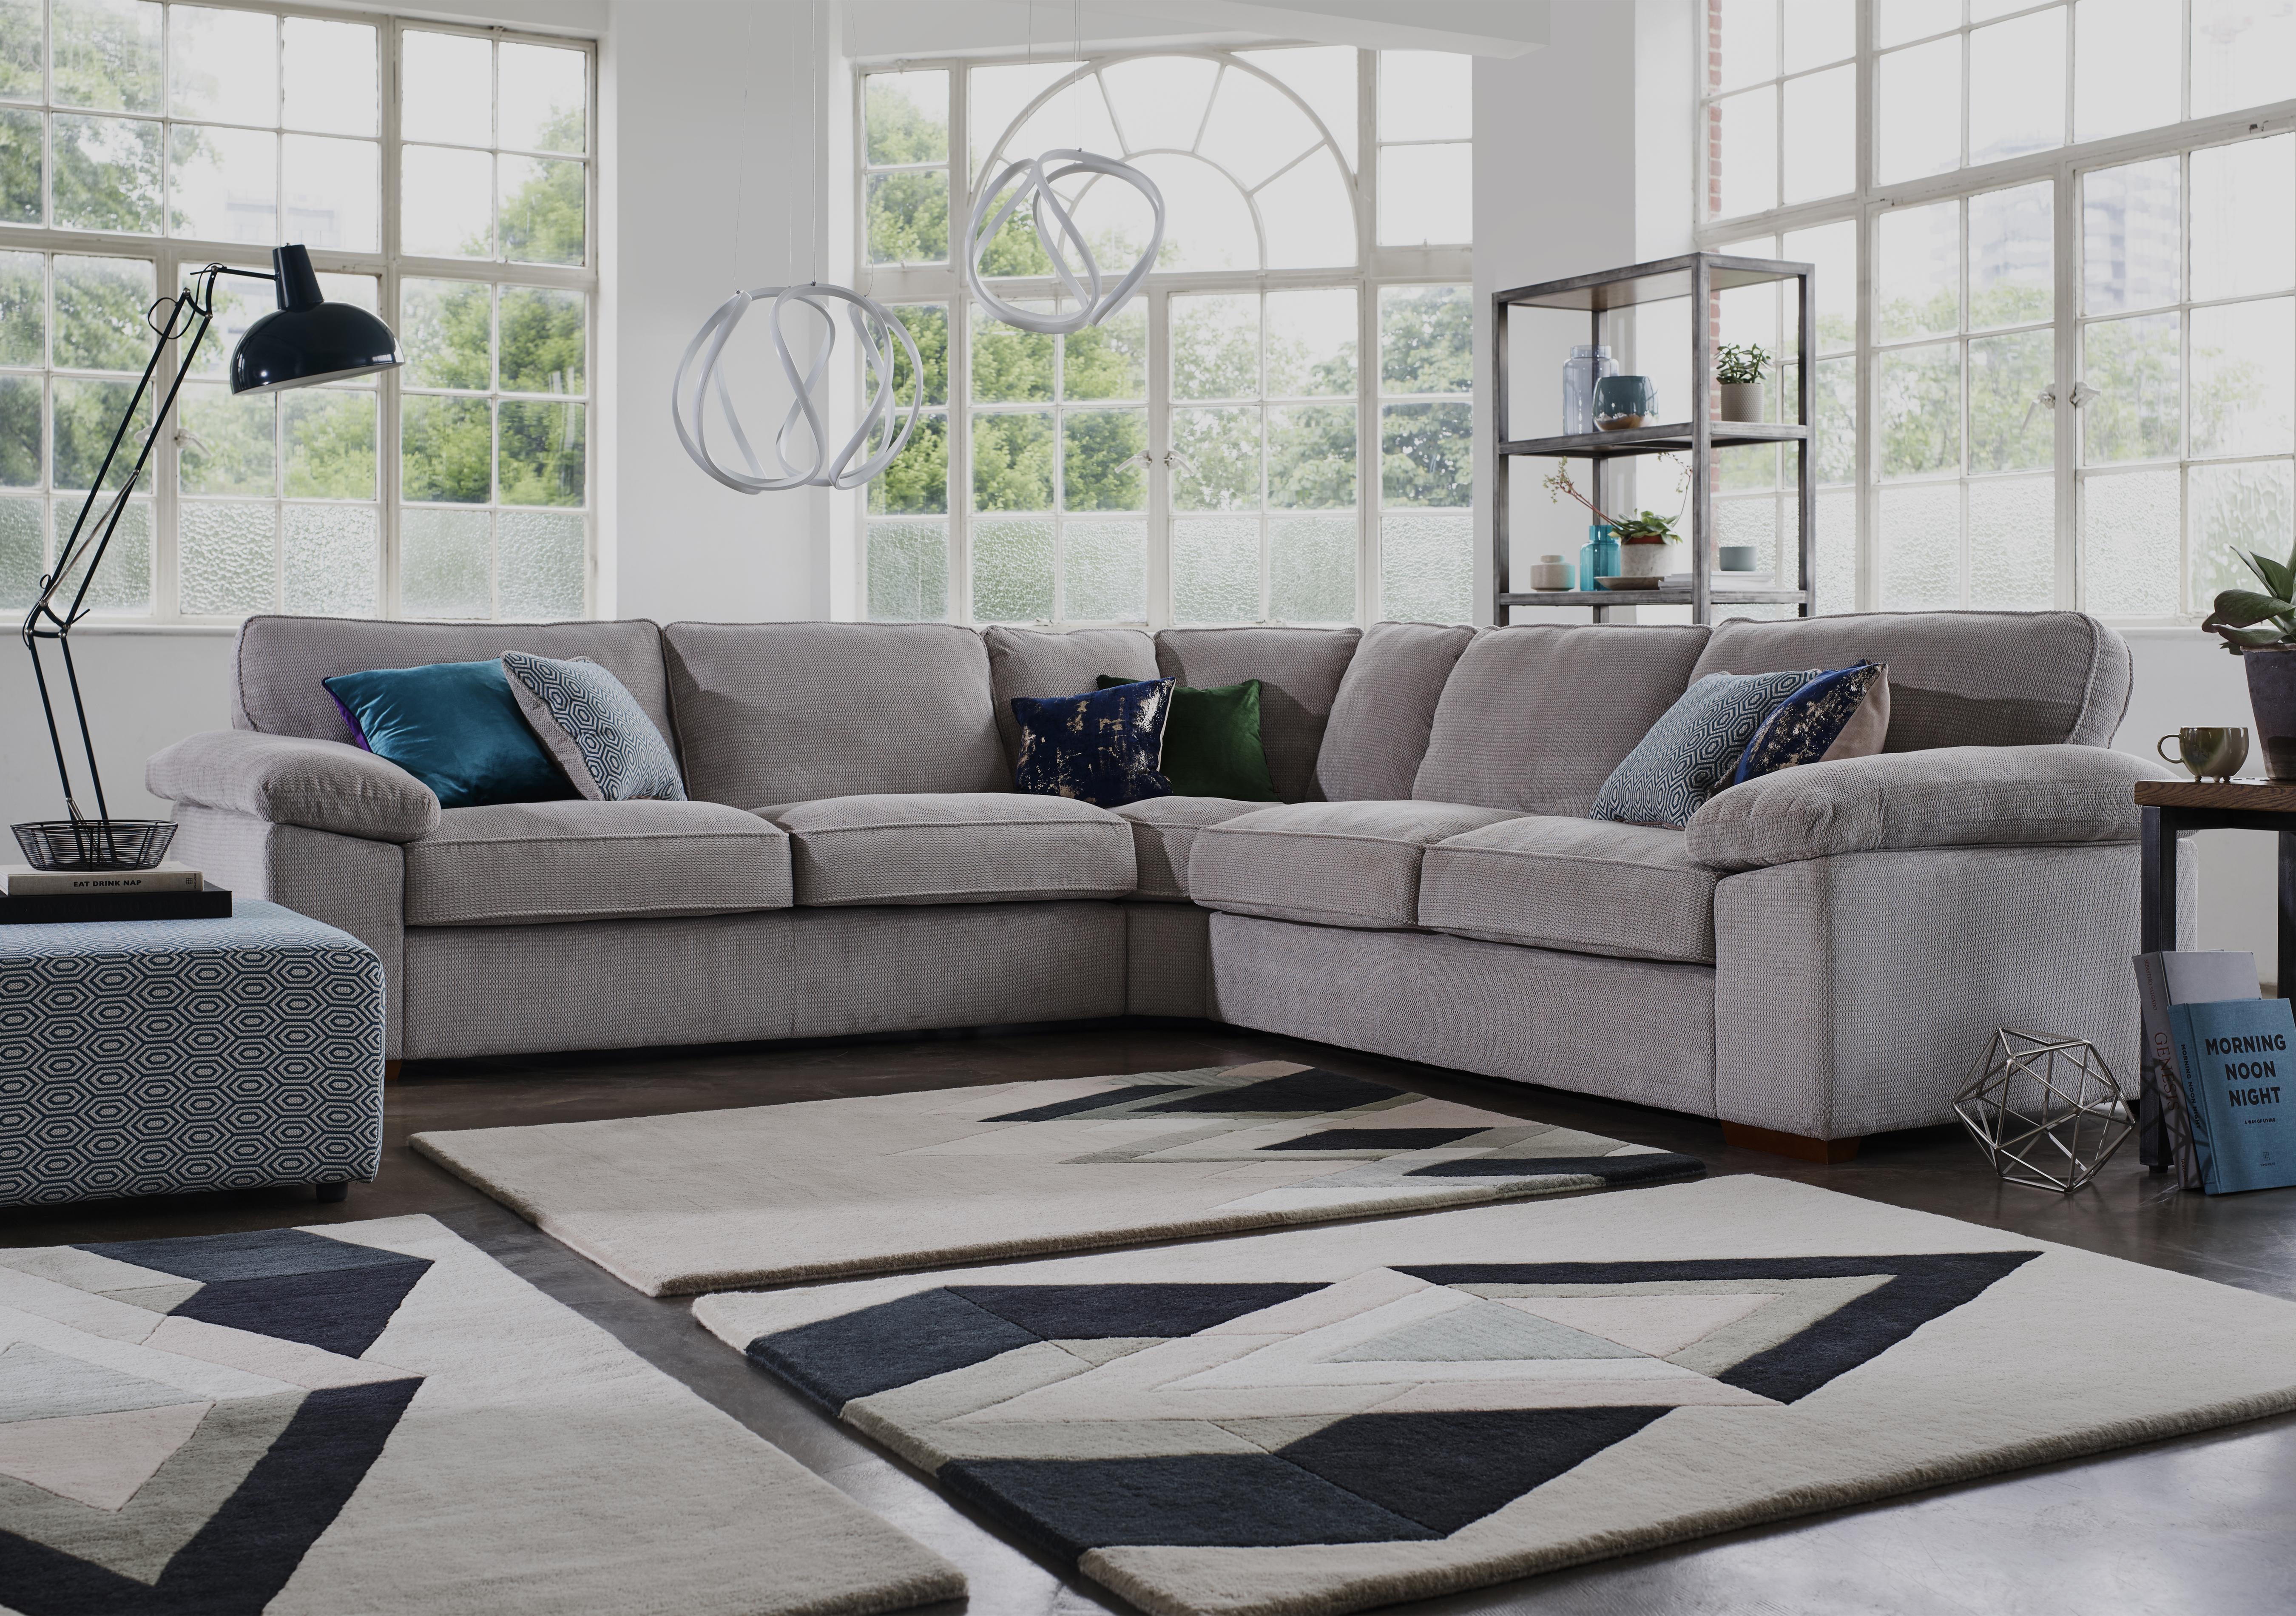 Choose the right corner sofas